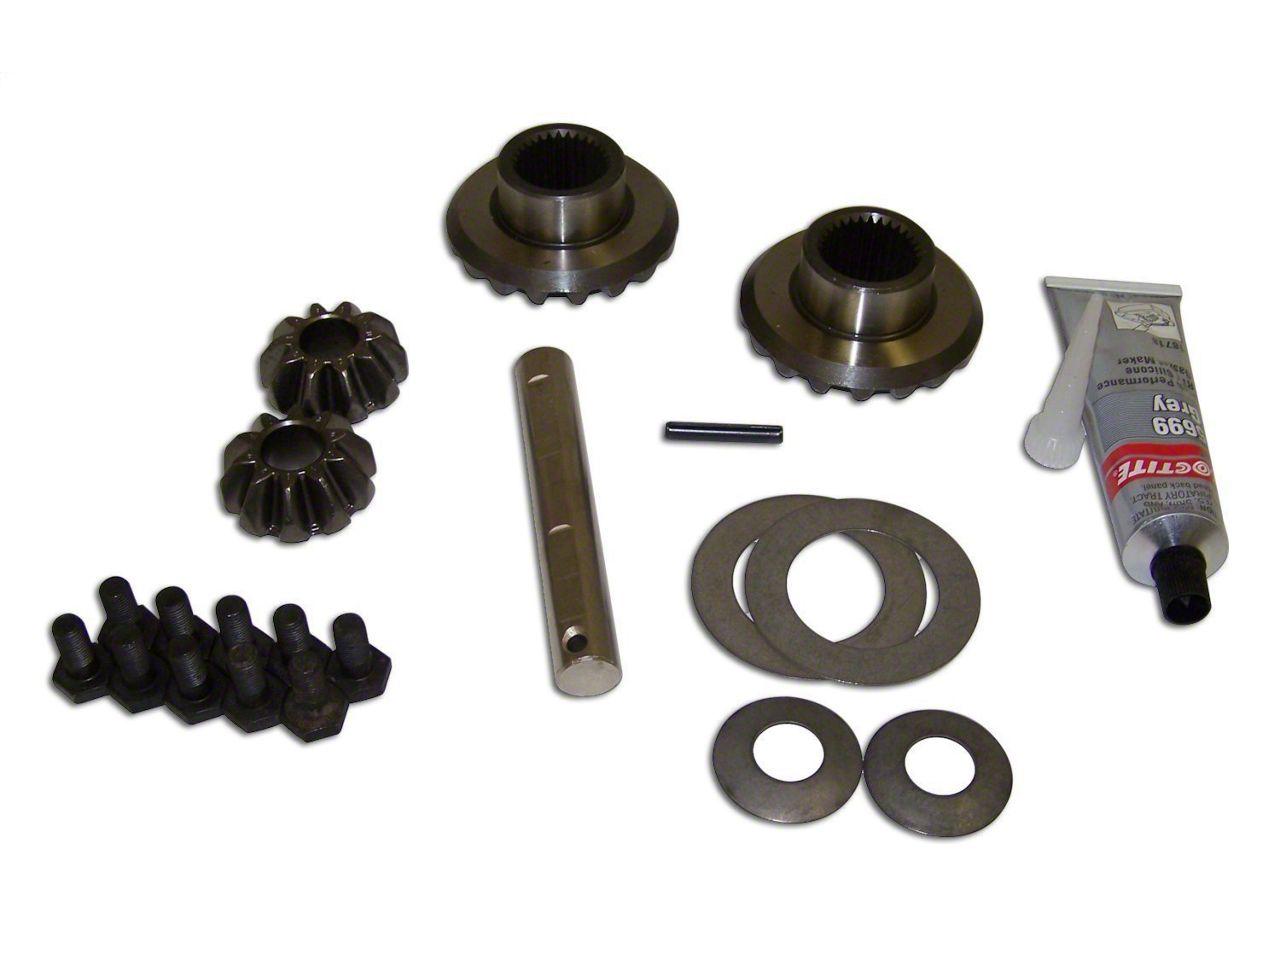 Dana 44 Rear Axle Differential Gear Kit (87-95 Jeep Wrangler YJ)